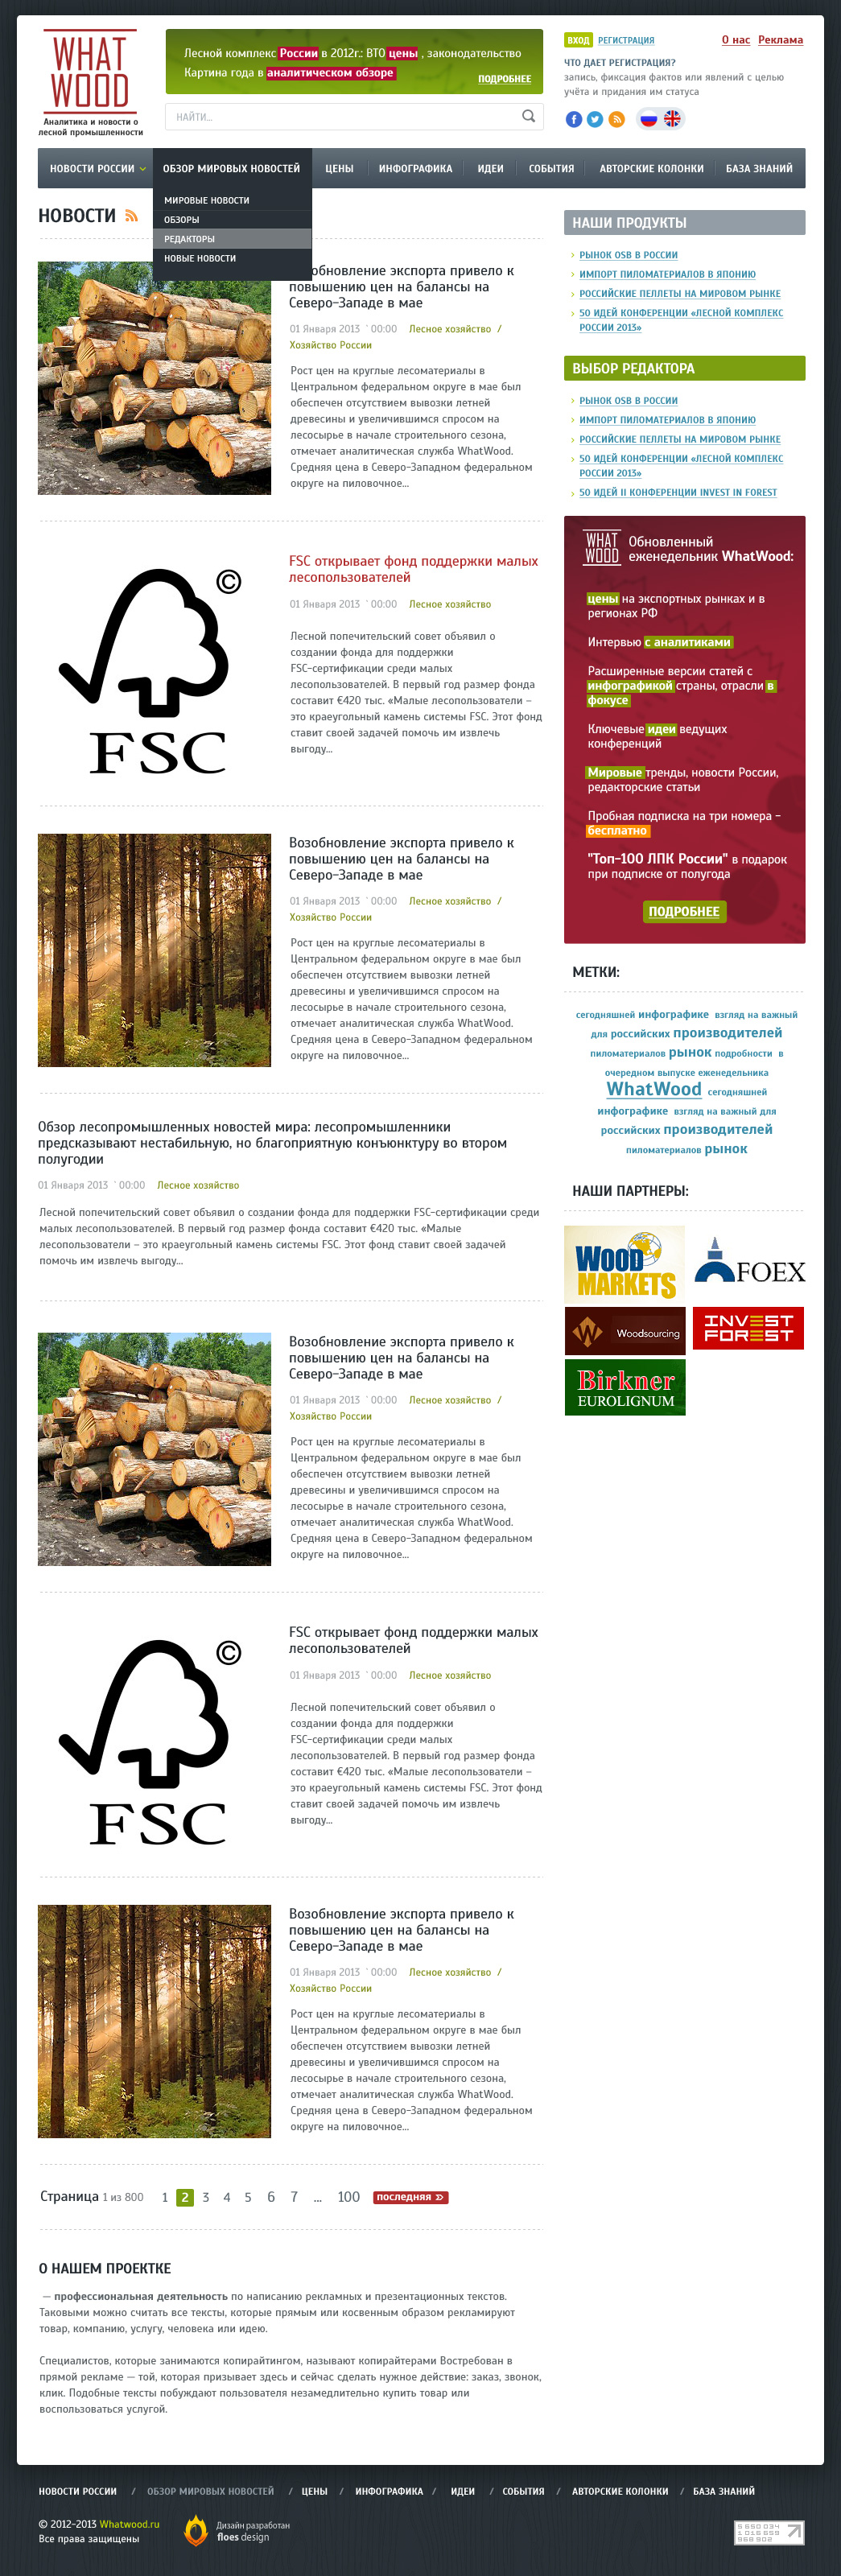 Whatwood - аналитика и новости о лесной промышленности